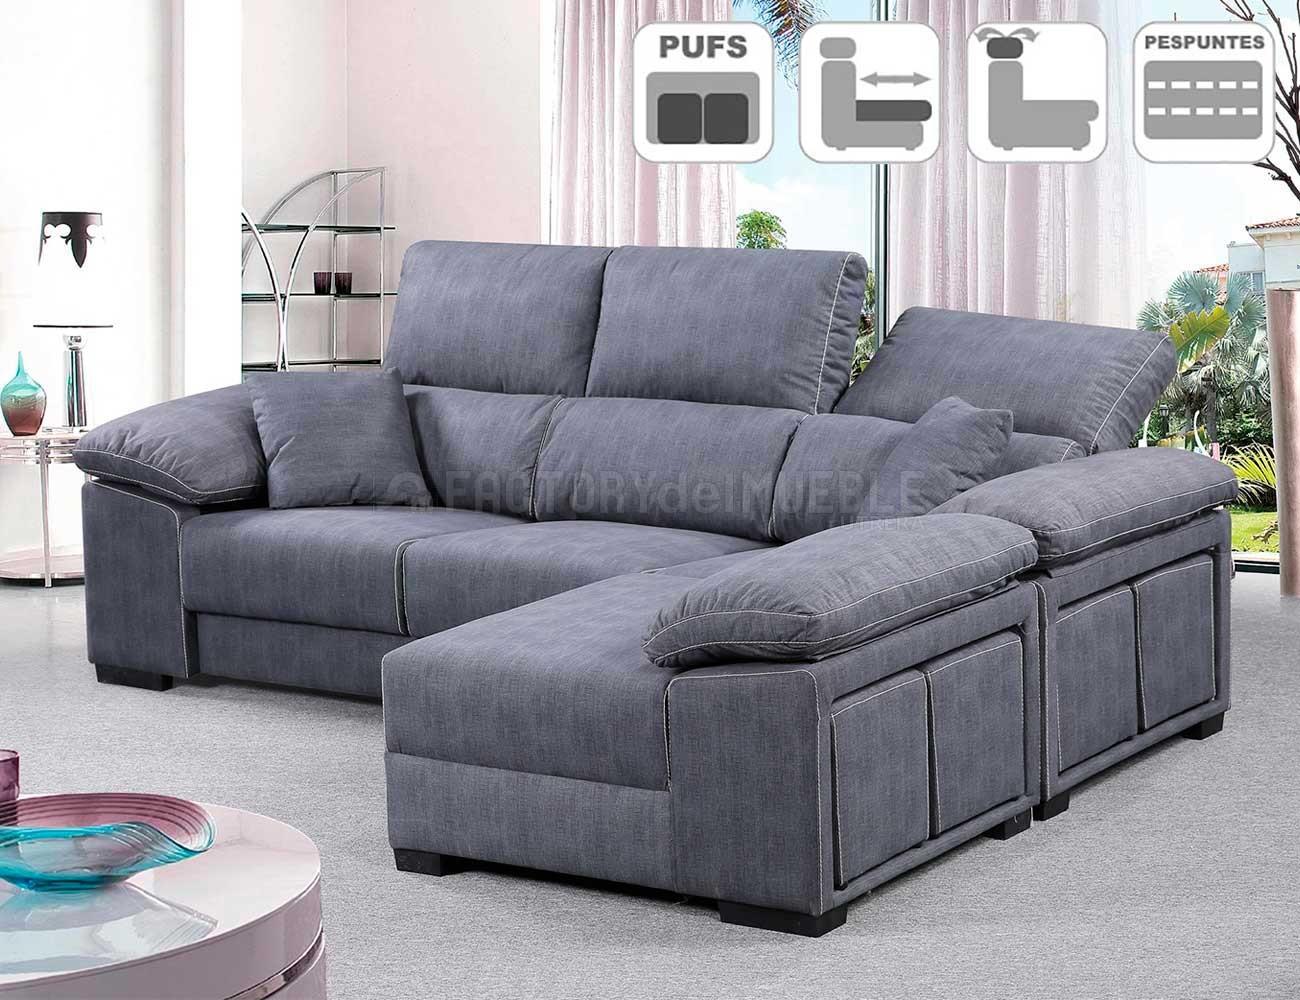 Sofa chaiselongue reversible 4 taburetes asientos extraible gris ceniza detalle1